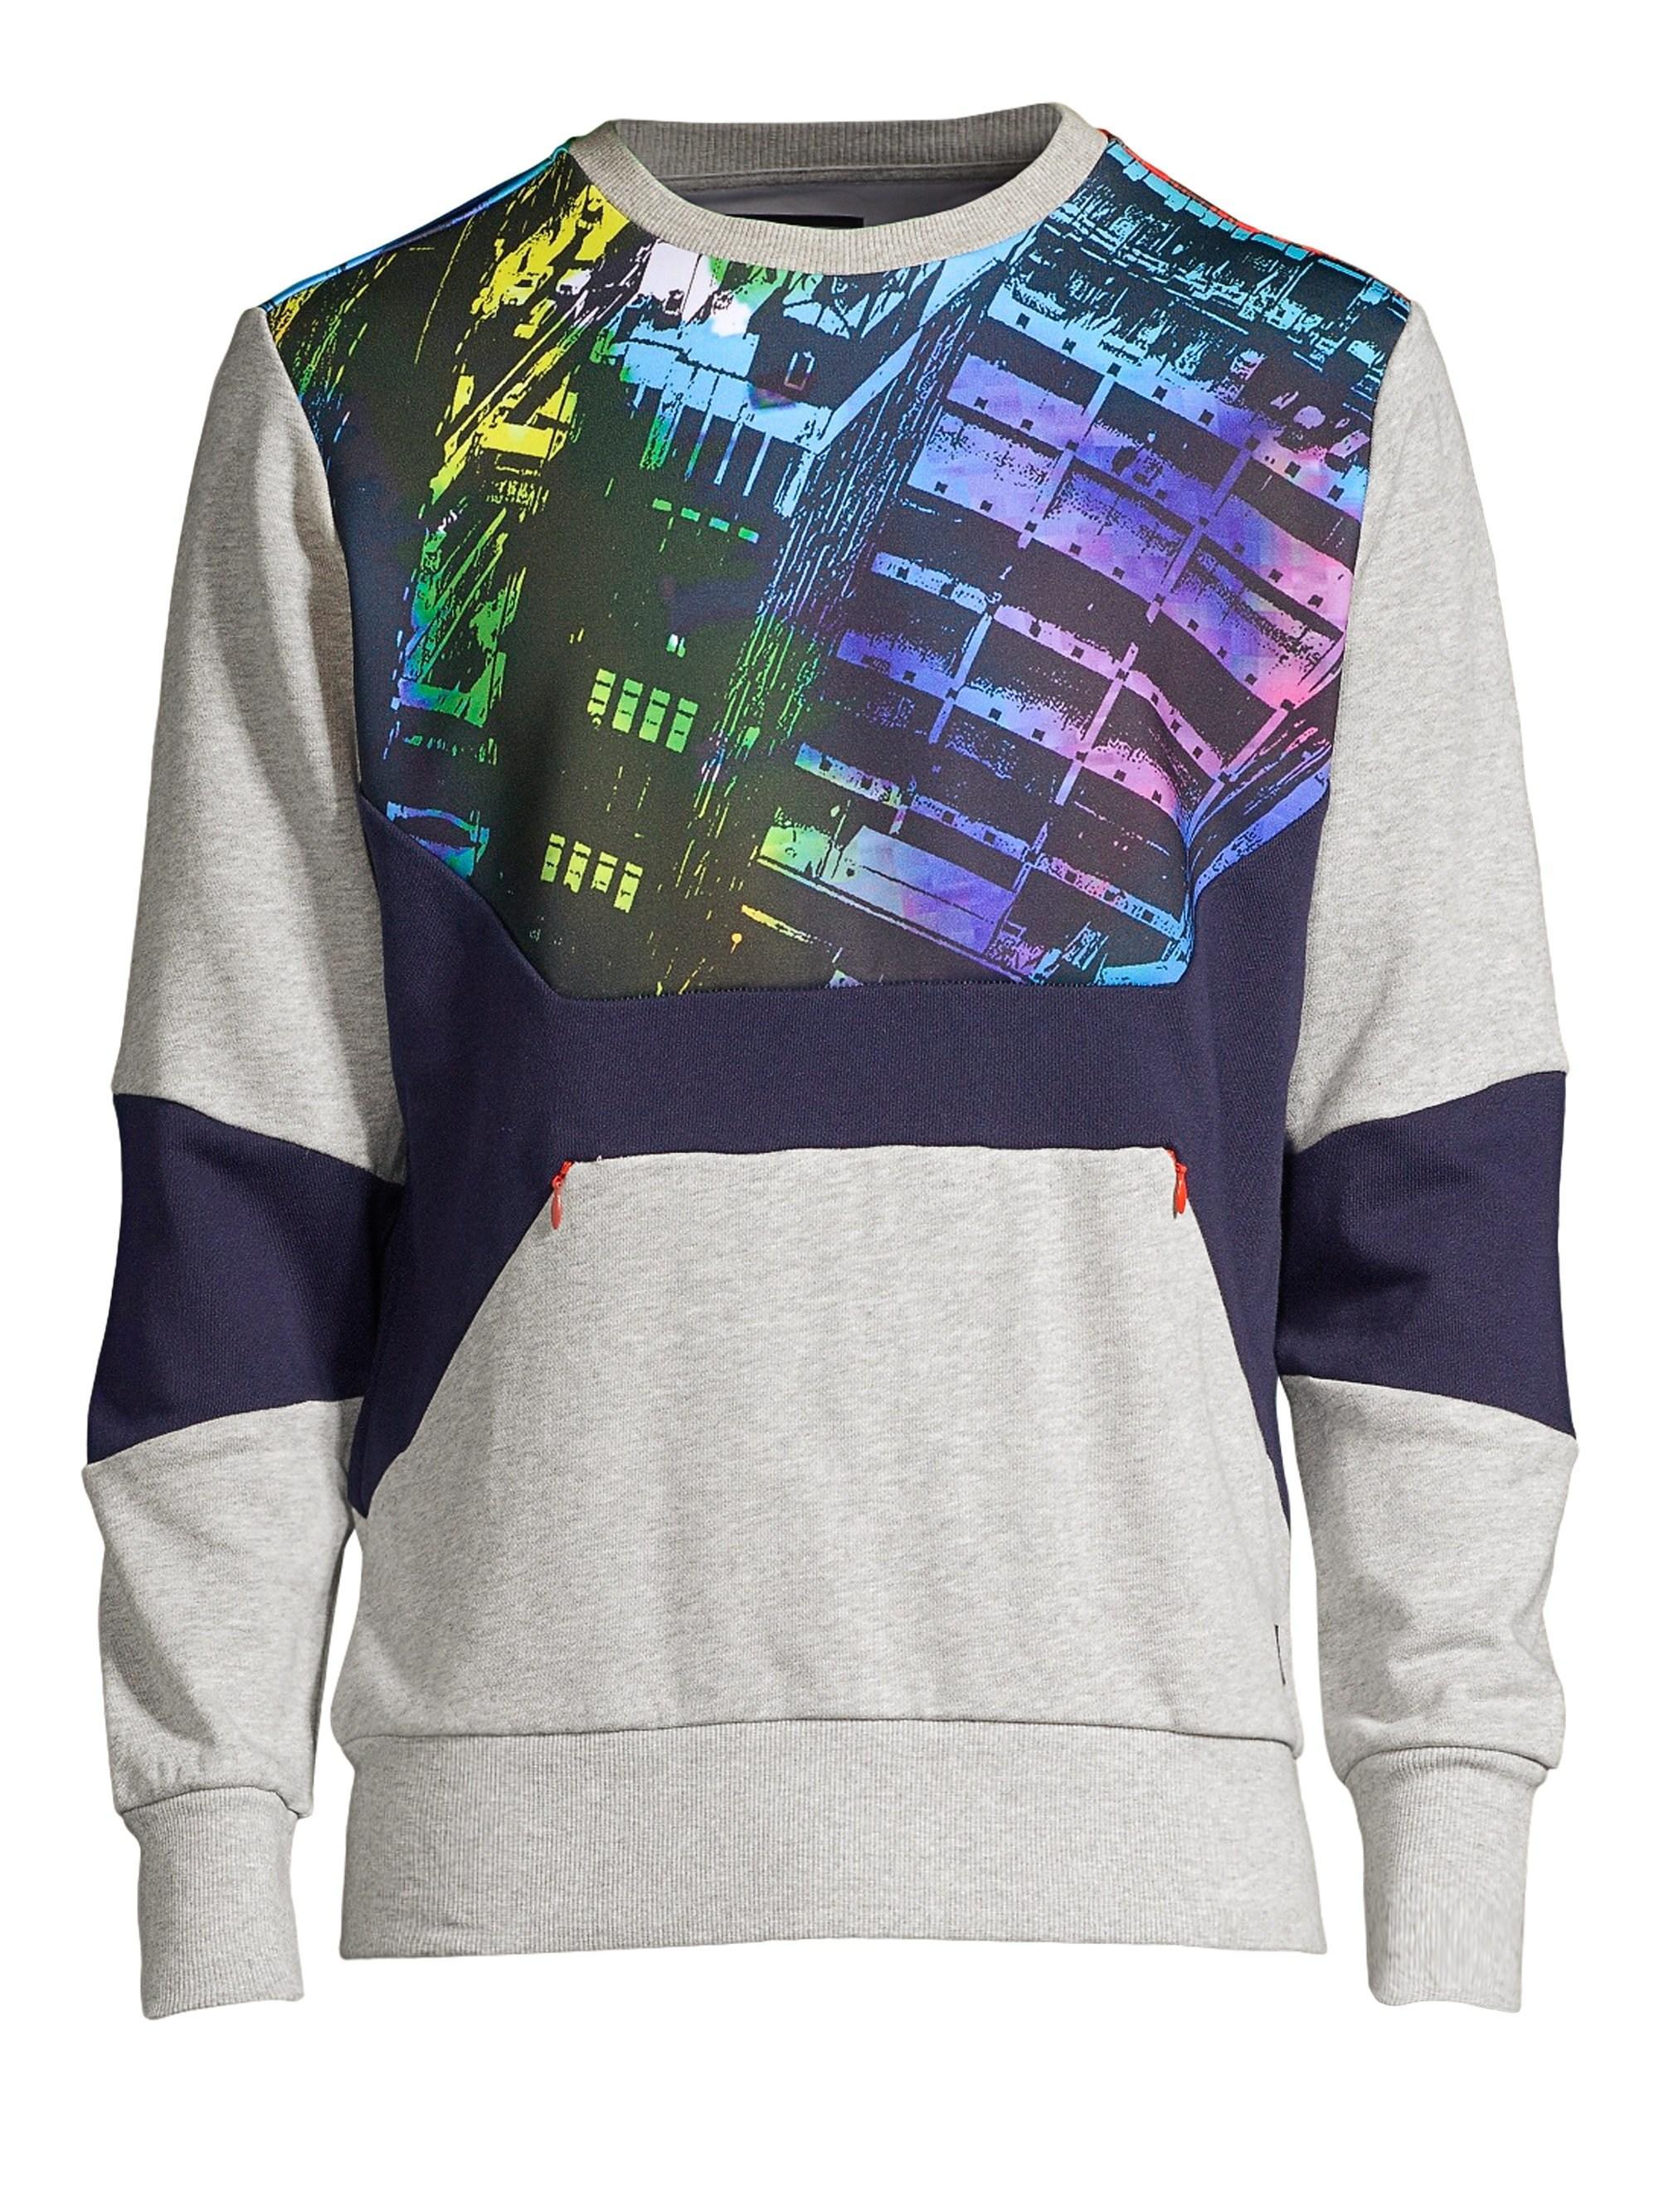 55a31e1f6b06 Lyst - PRPS Men s Graphic Crewneck Sweatshirt - Heather Grey - Size ...